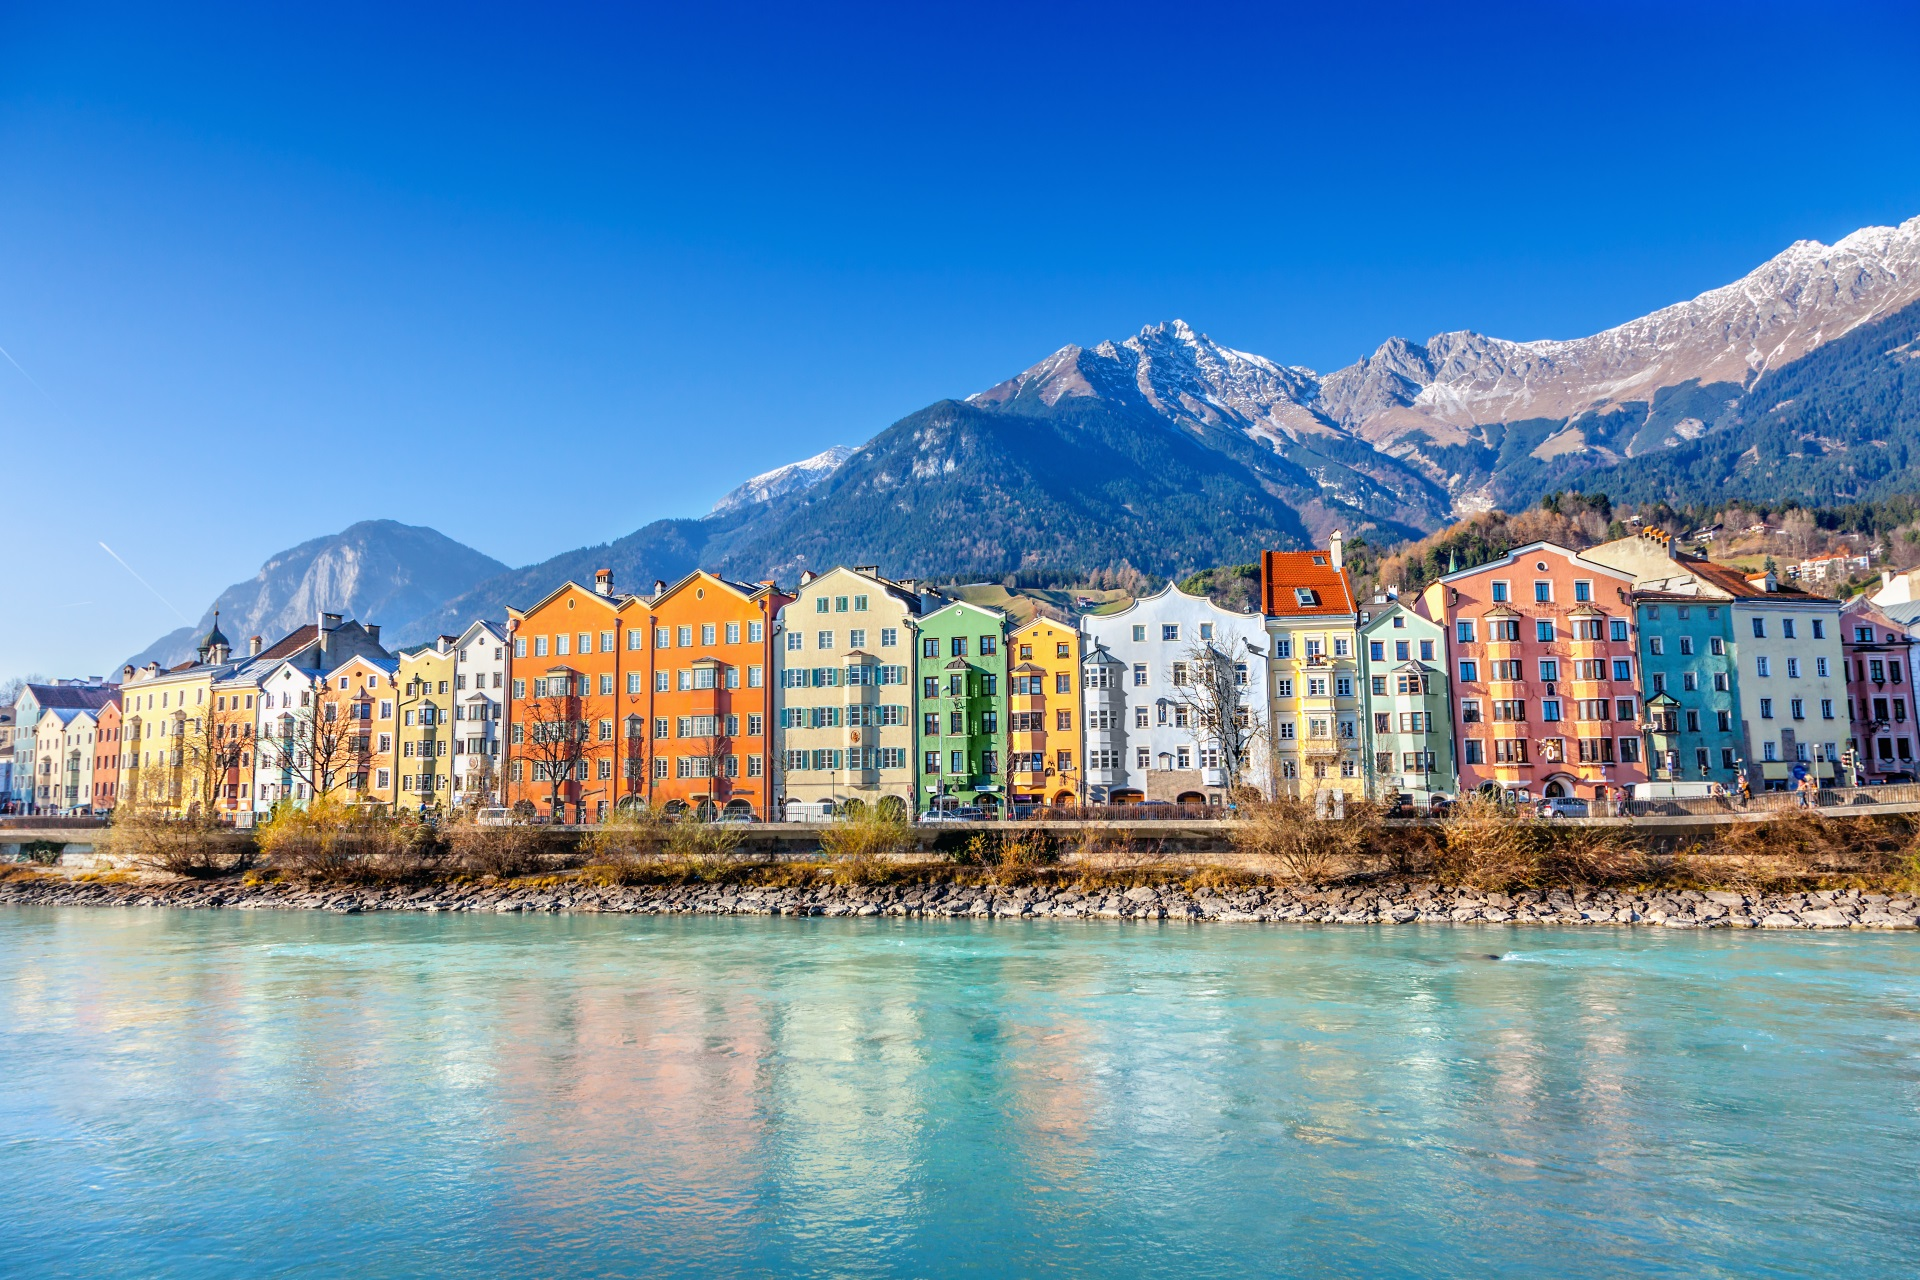 Innsbruck ab 159 € 6